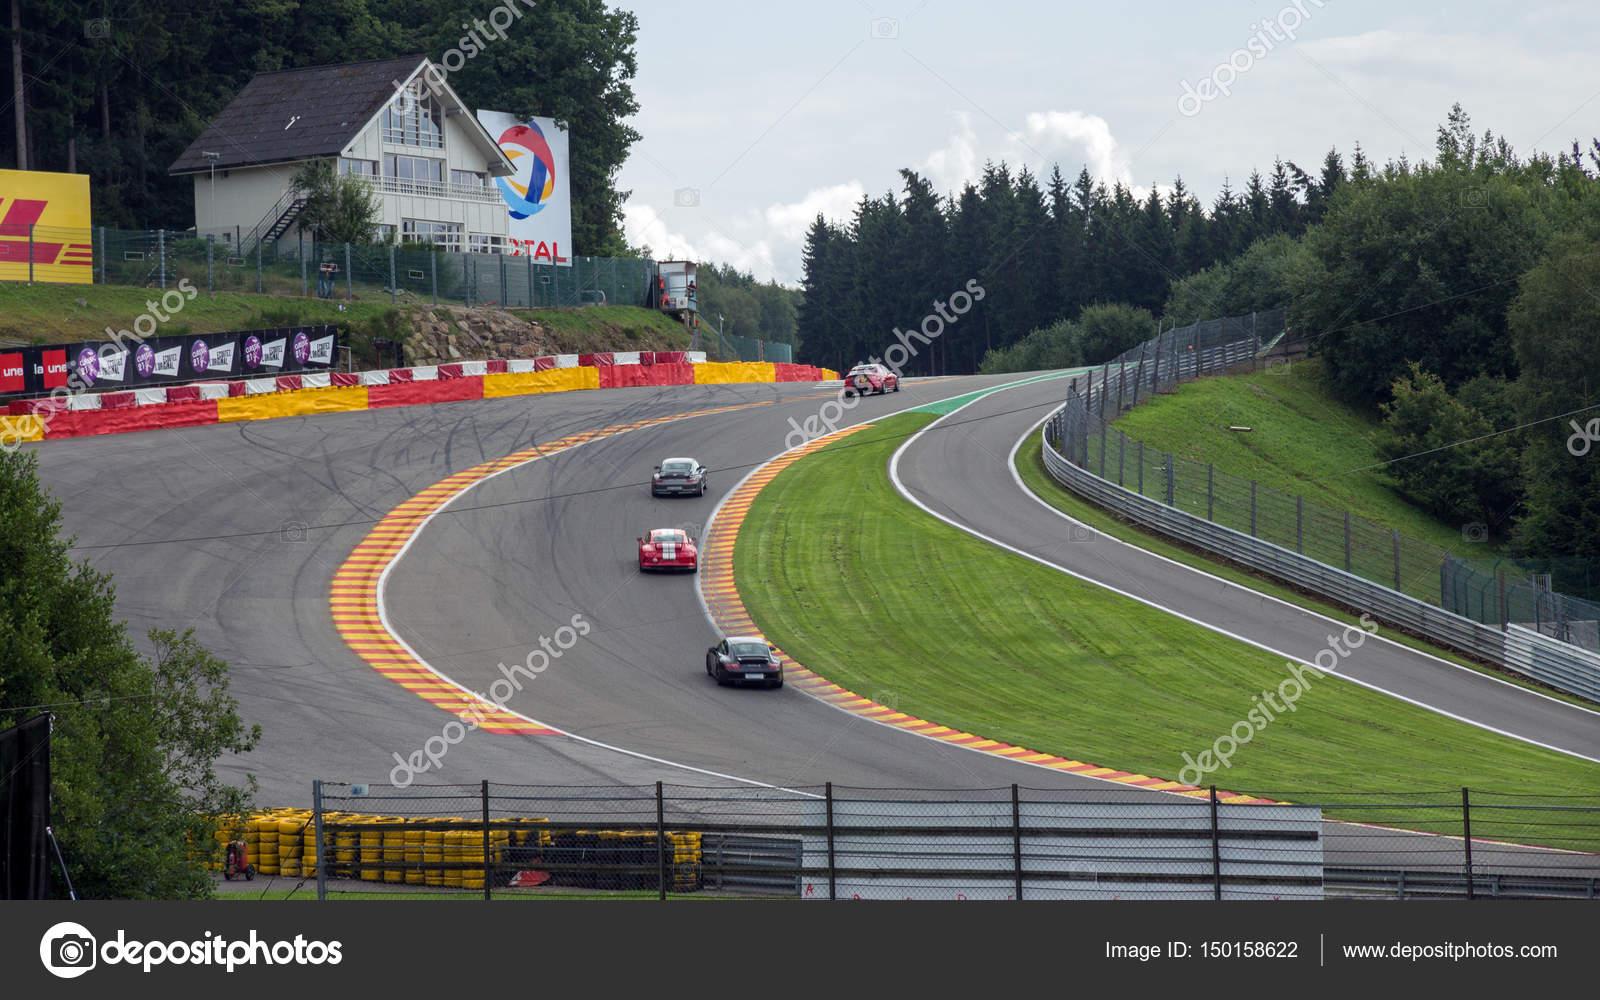 Circuito De Spa Francorchamps : Spa francorchamps race circuit belgium u2014 foto editorial de stock